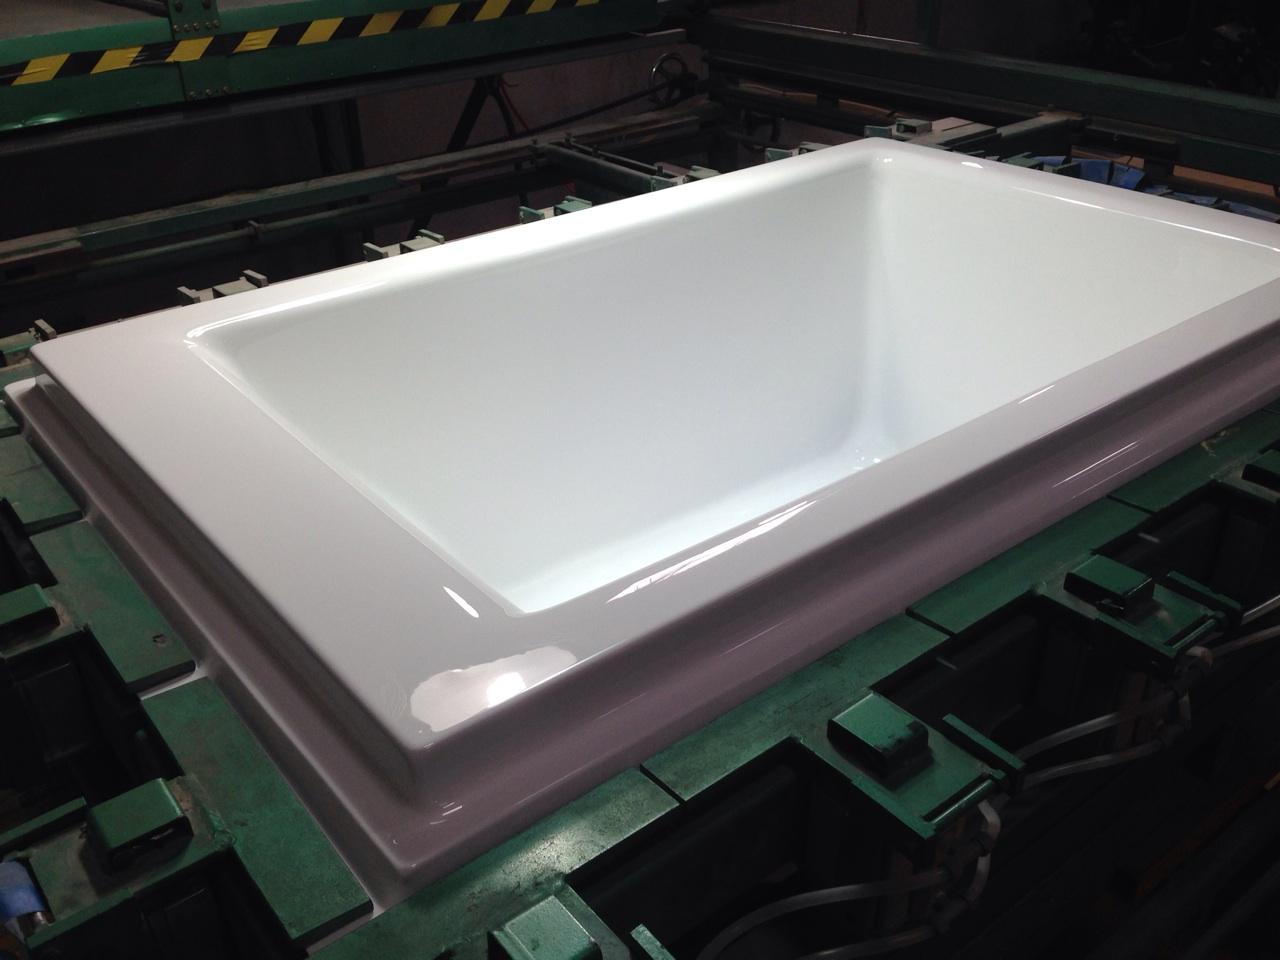 Acrylic Bathtub Thermoforming Machine For Sale U2013 Bathtub Forming Machine  Manufacturer From China (106286596).